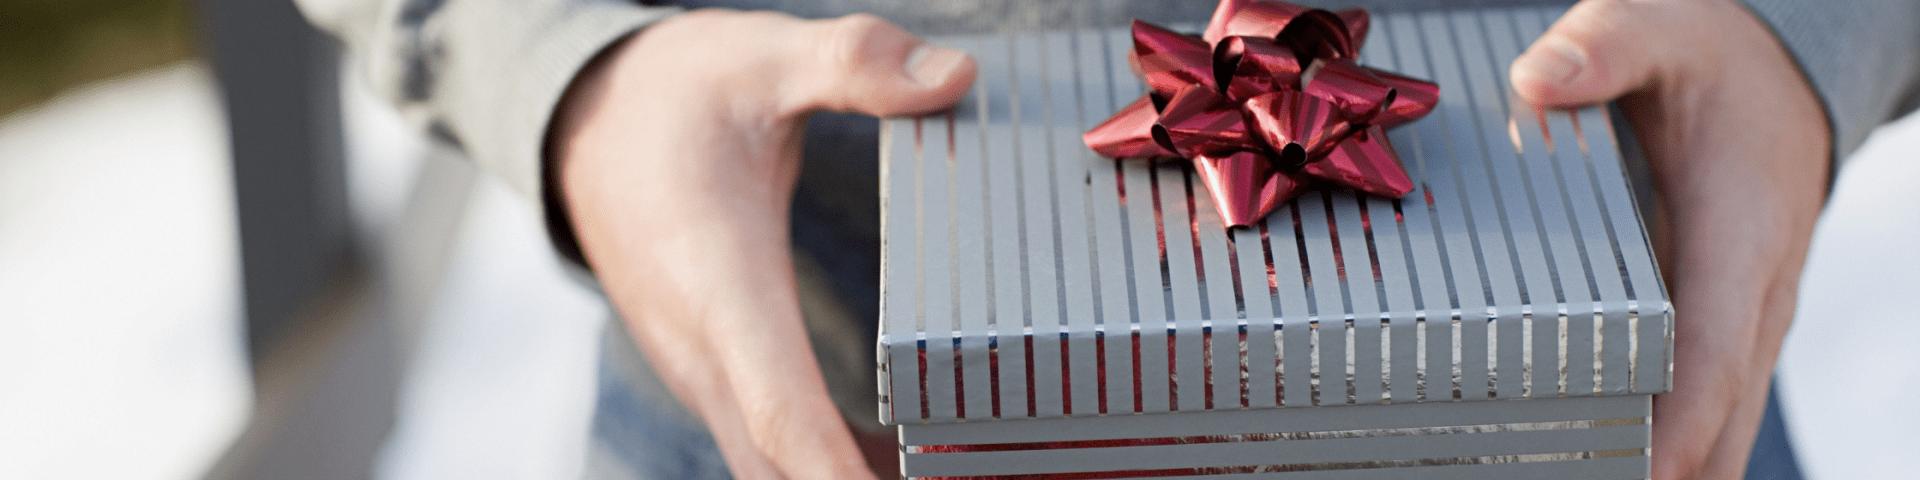 gifts for entrepreneurs cover